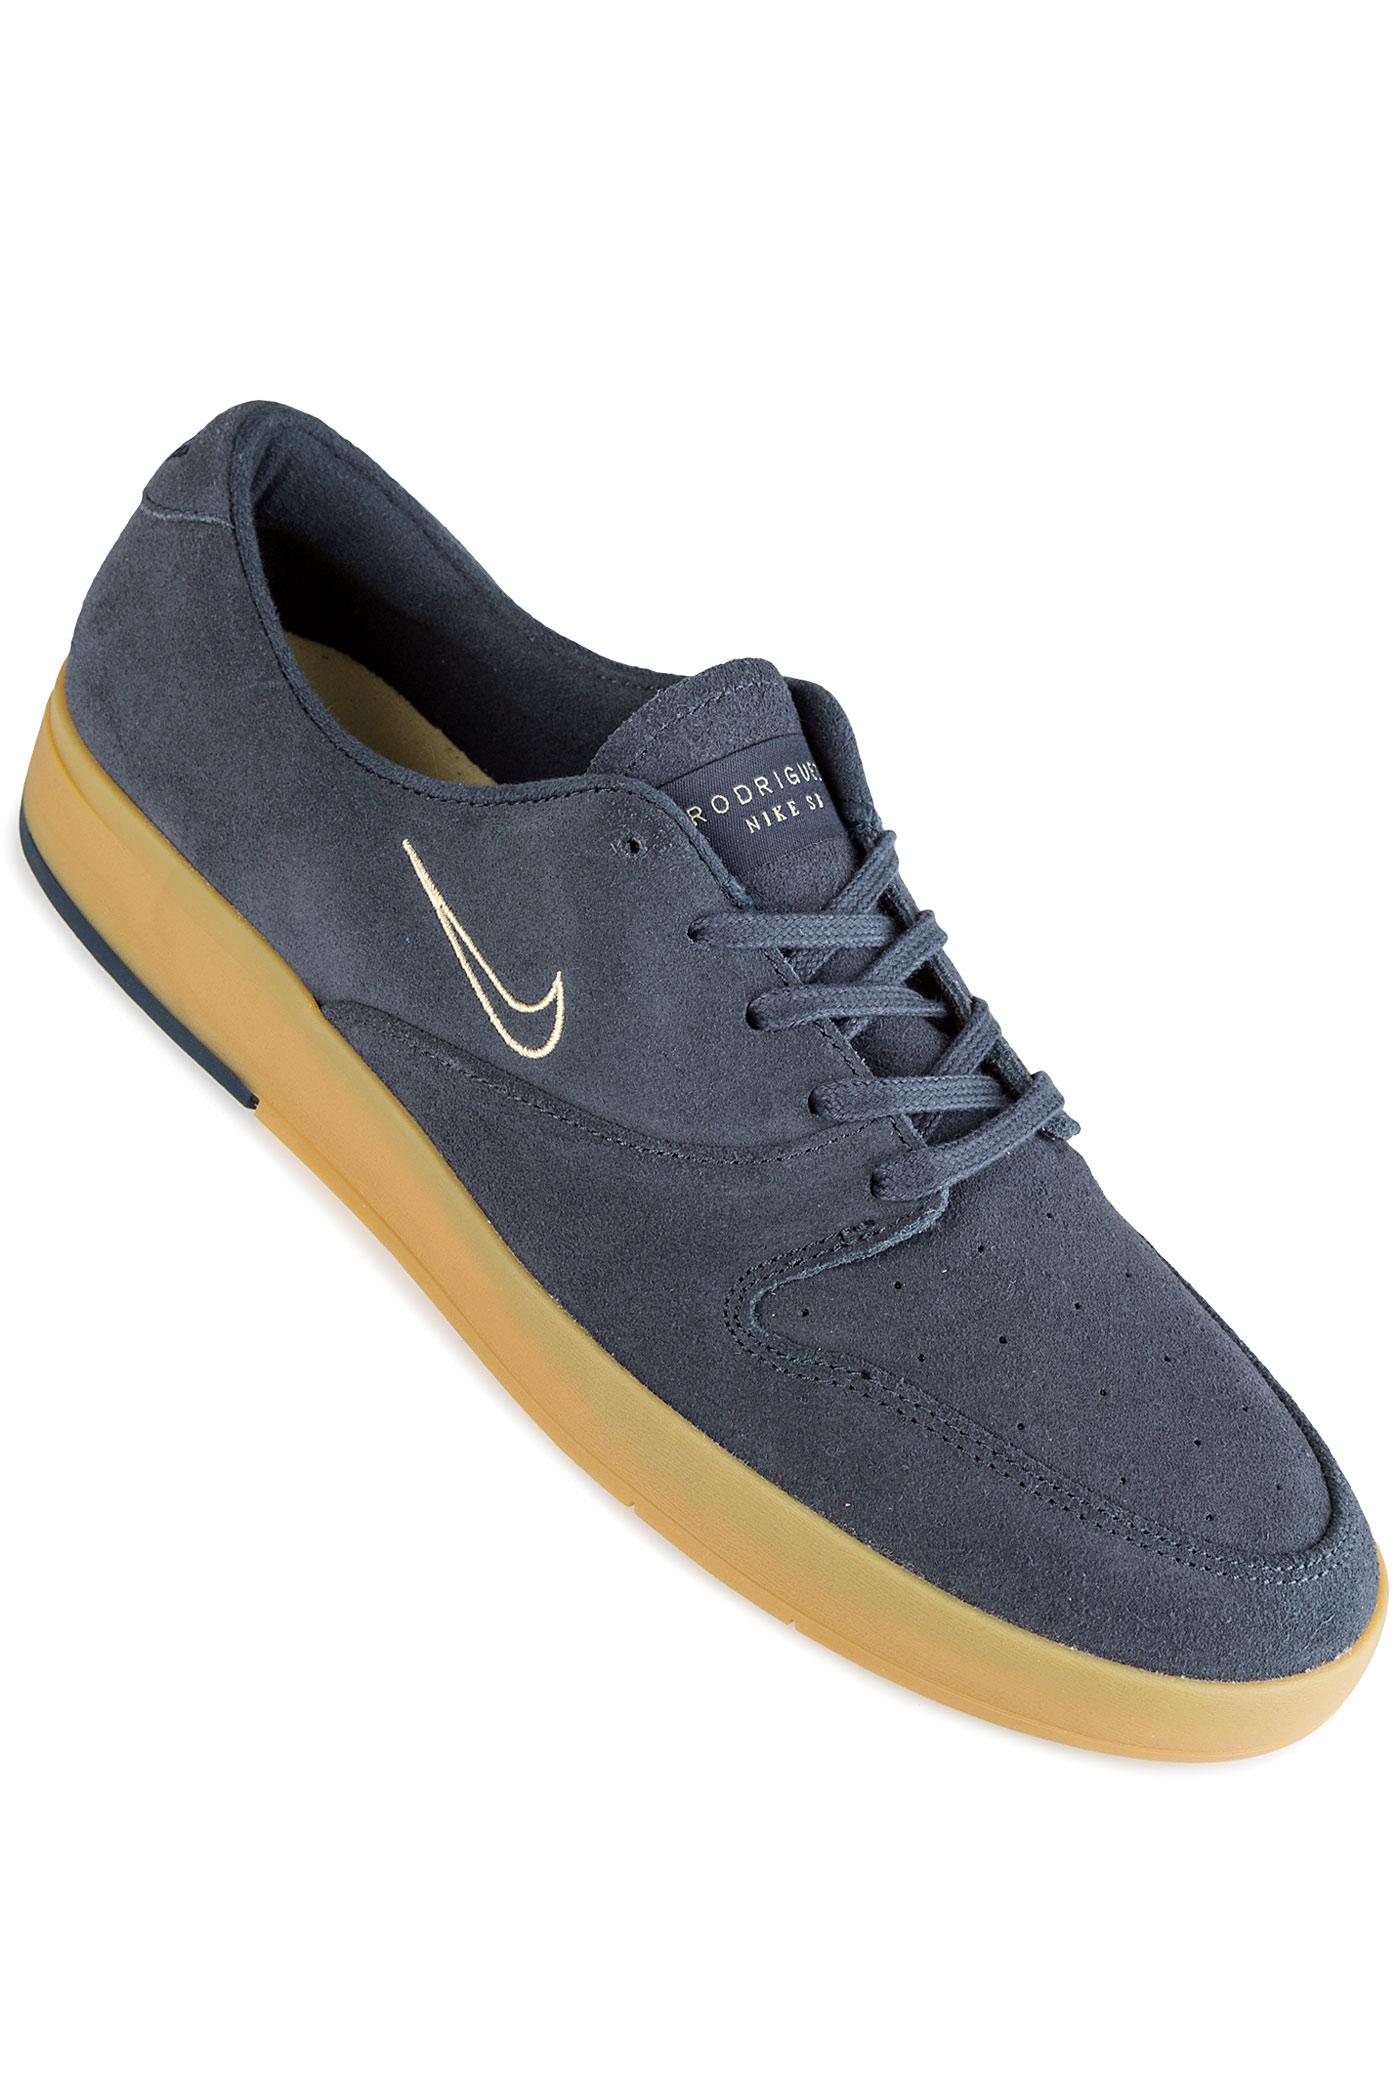 save off 65b62 eb59b Nike SB Zoom P-Rod X Shoes (thunder blue)